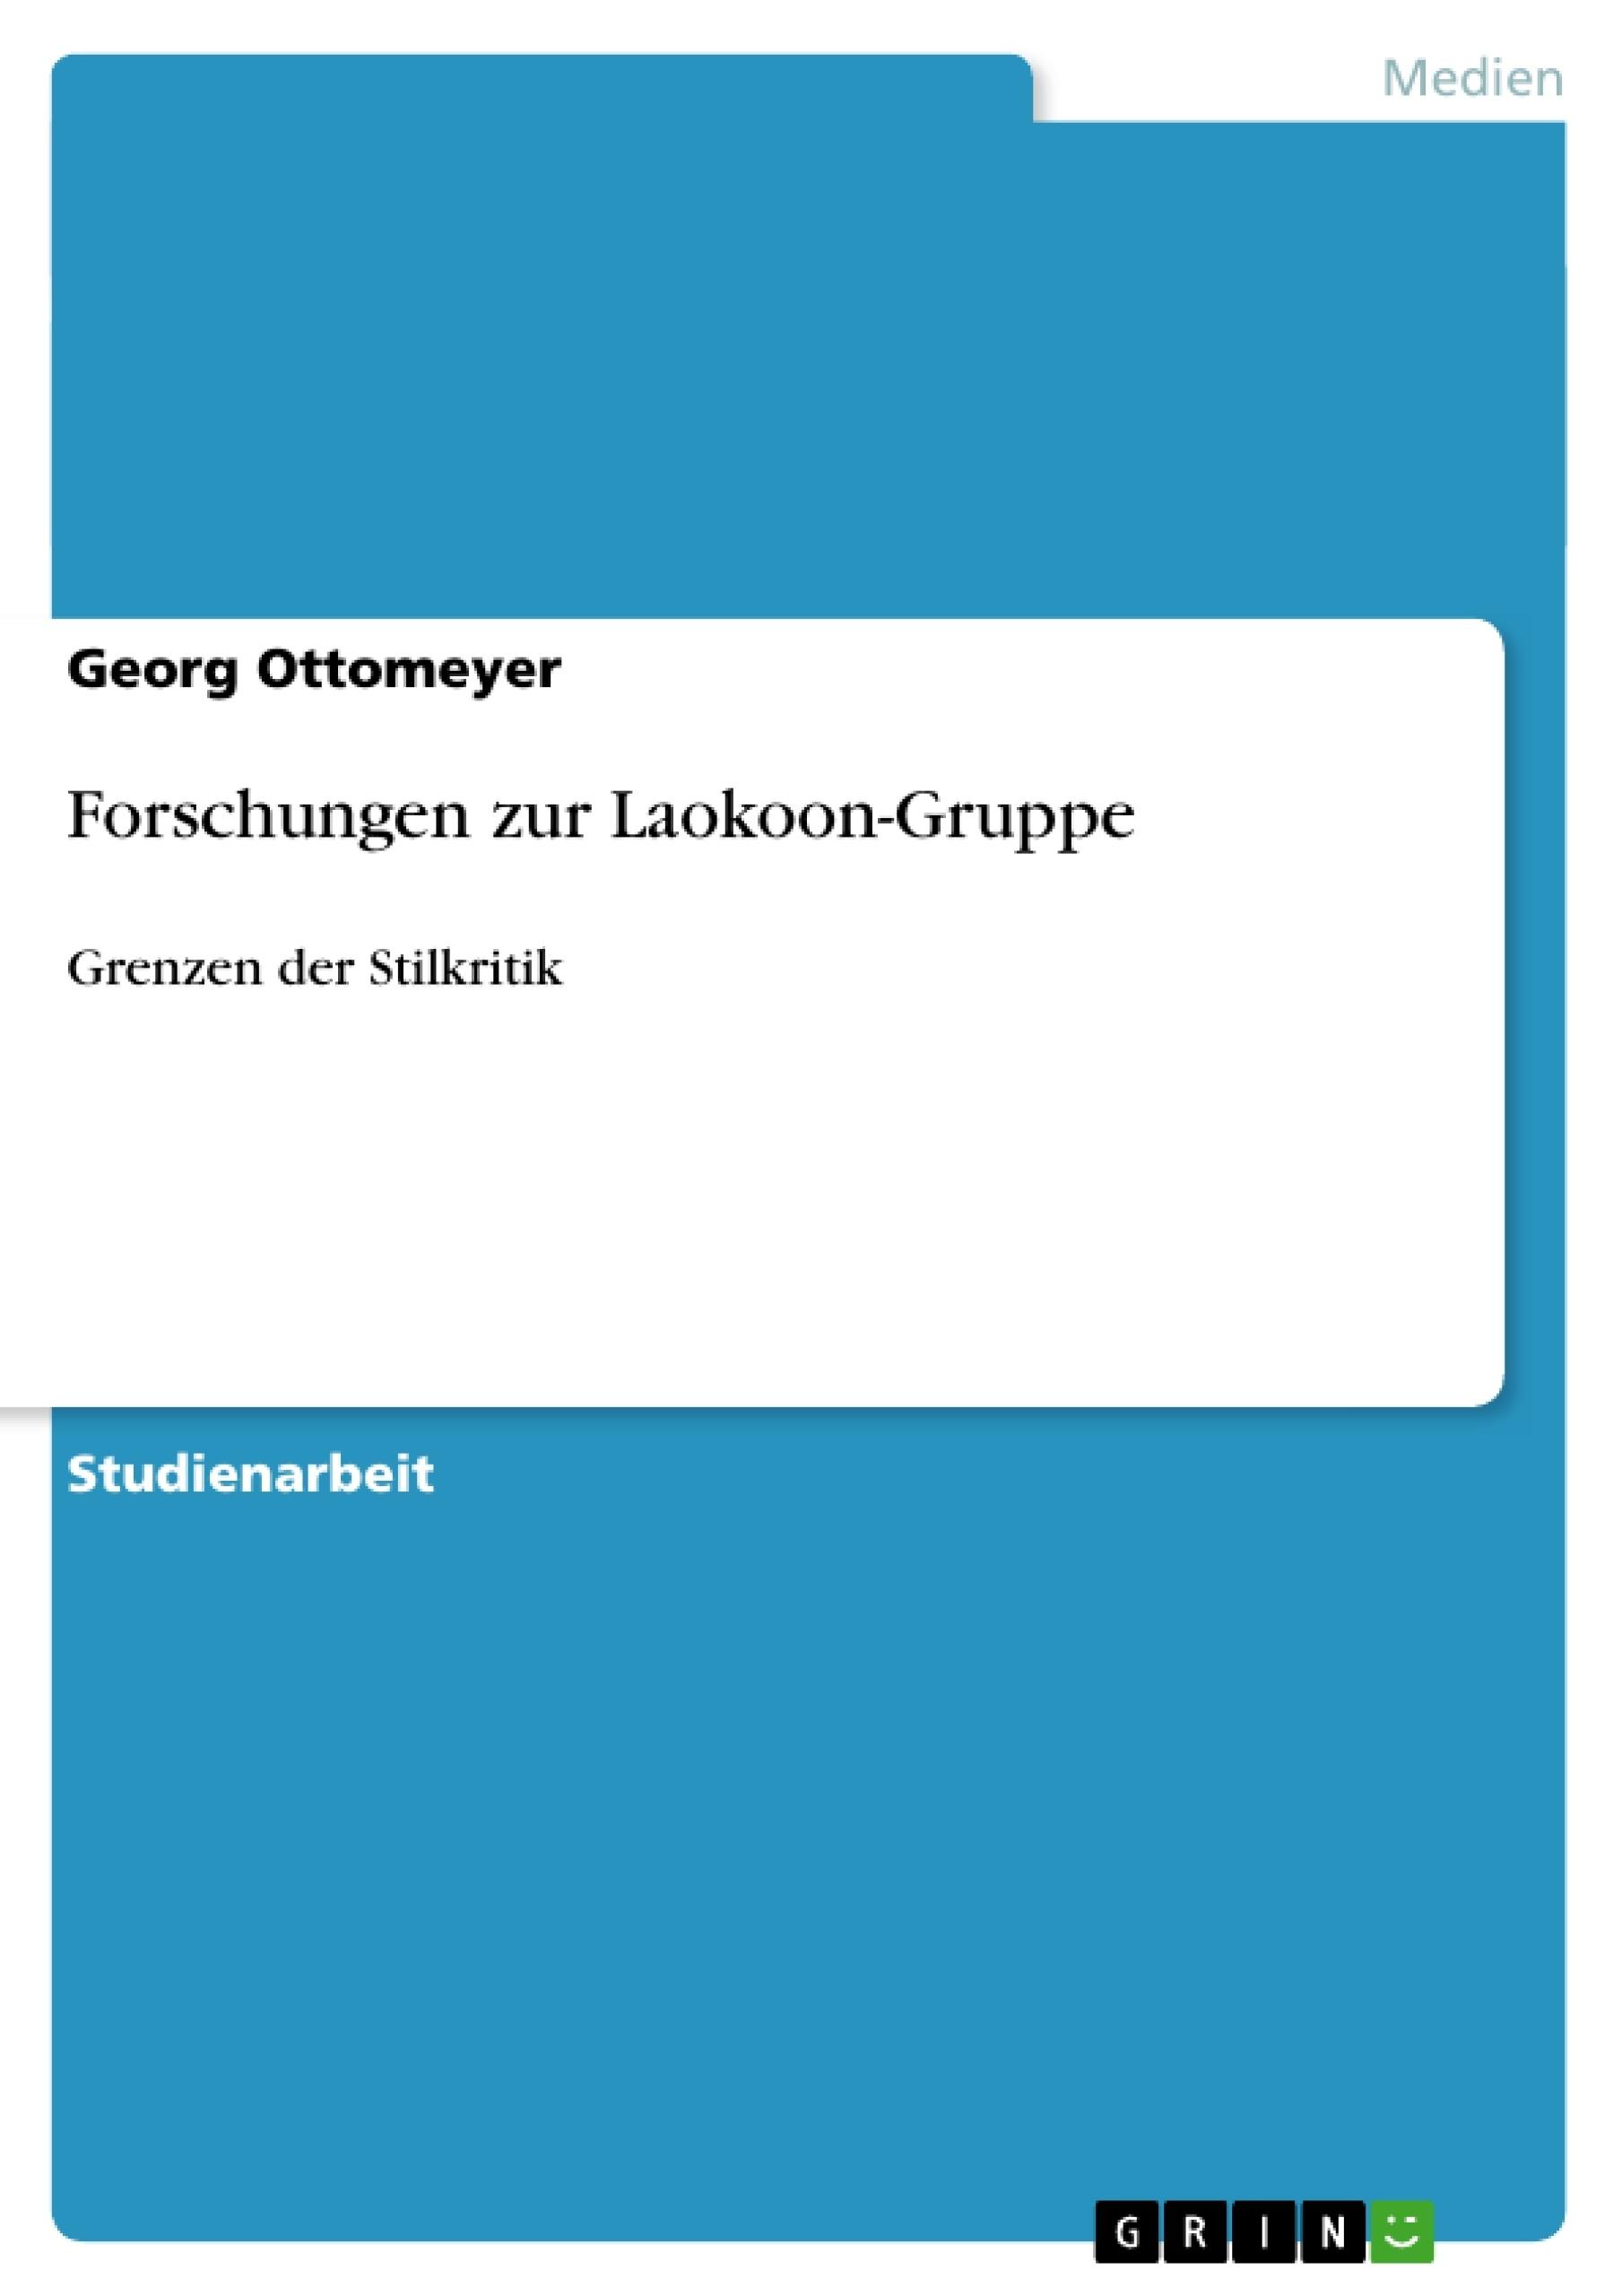 Titel: Forschungen zur Laokoon-Gruppe